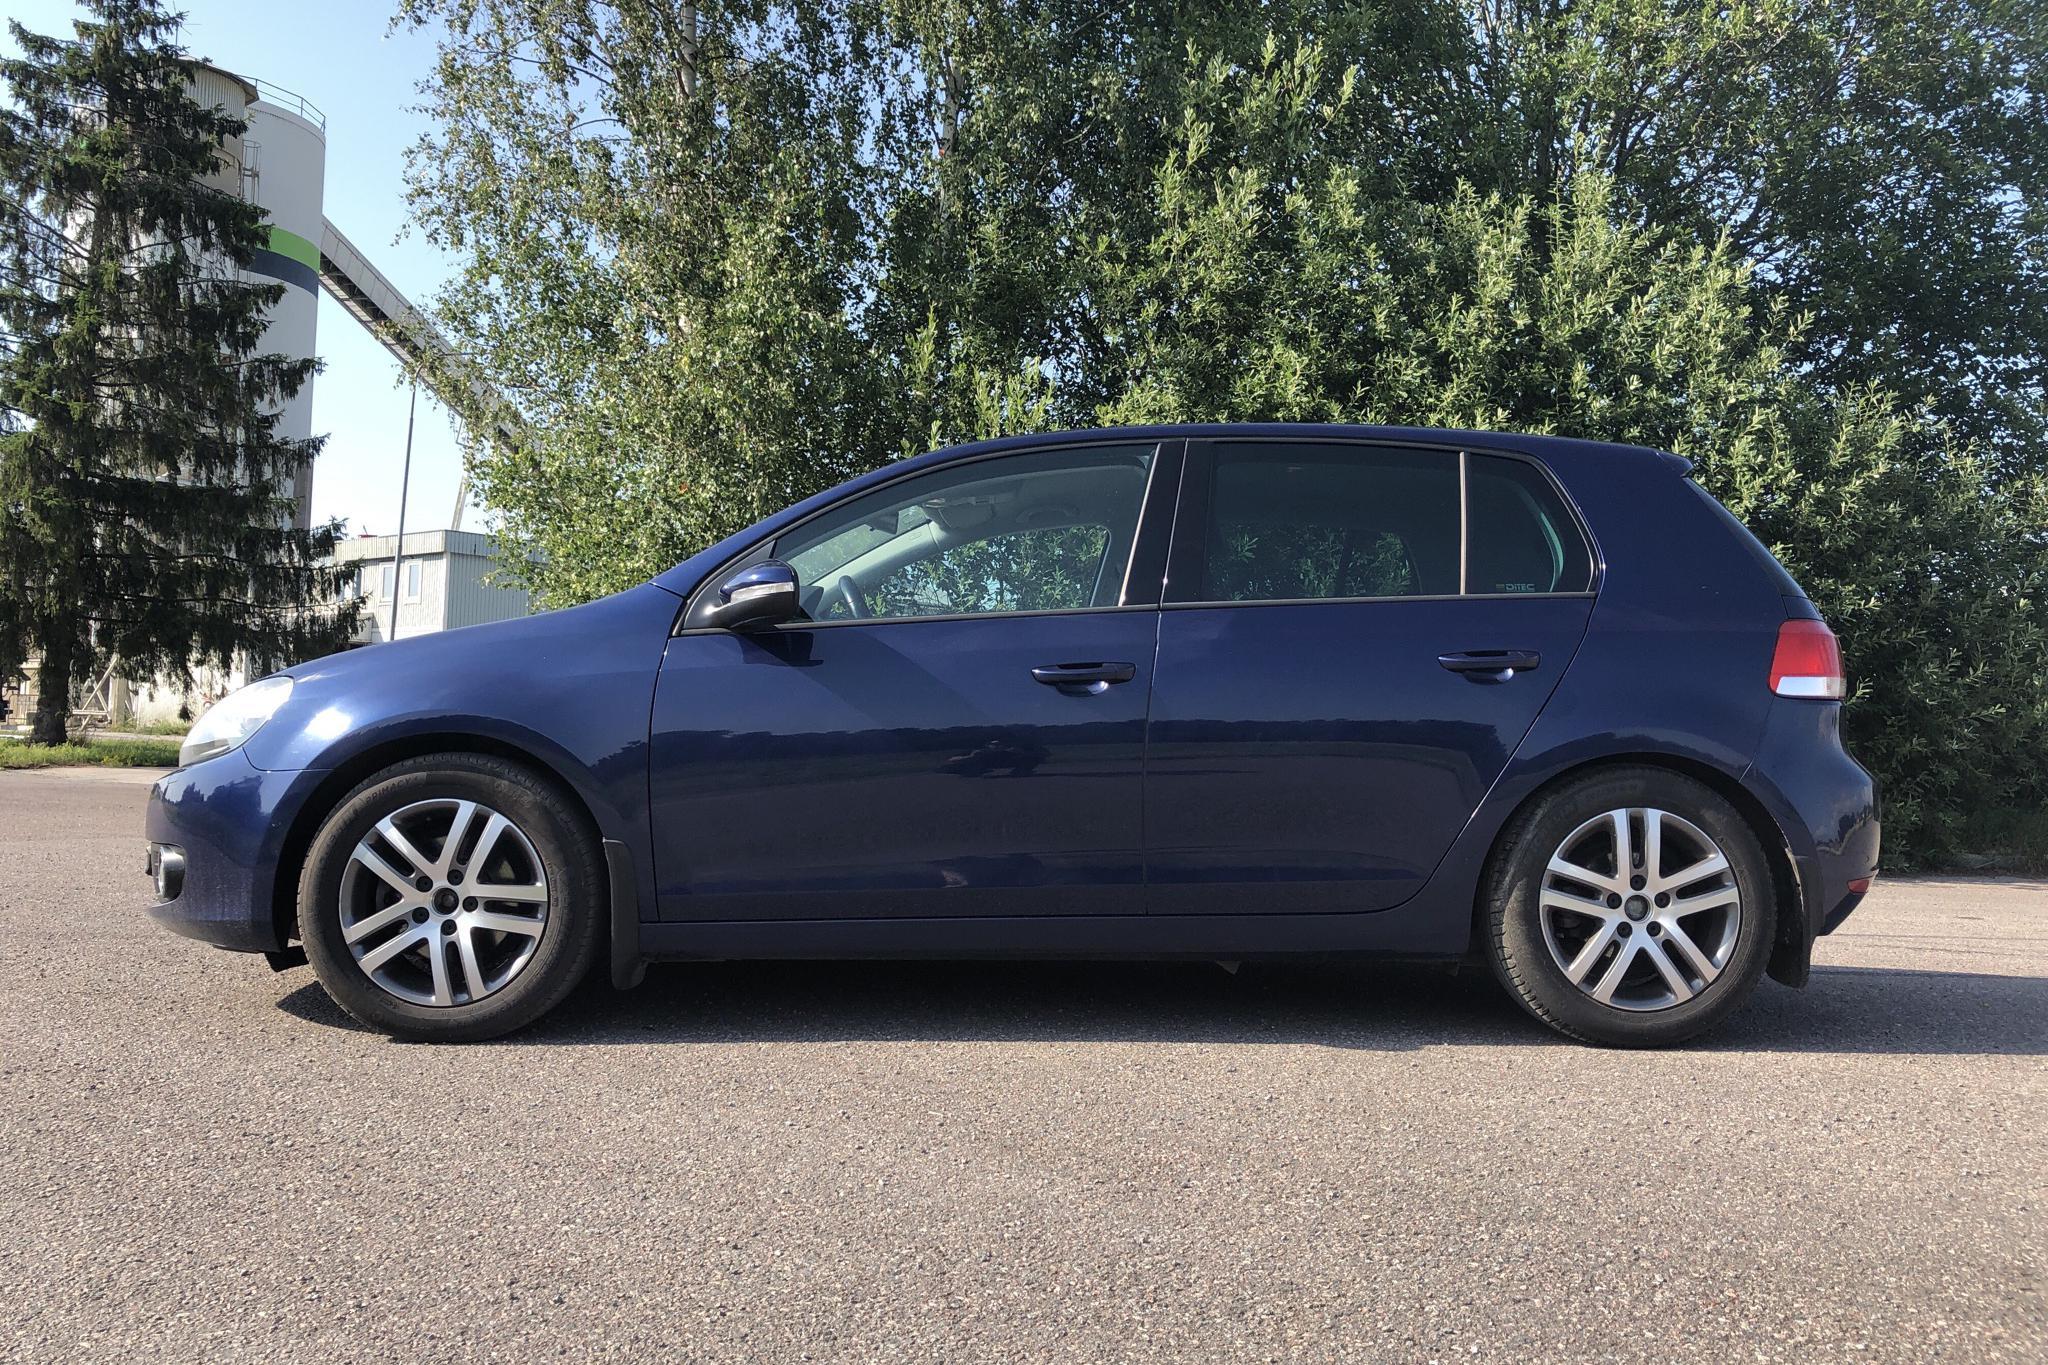 VW Golf VI 1.6 TDI BlueMotion Technology 5dr (105hk) - 13 994 mil - Manuell - Dark Blue - 2012